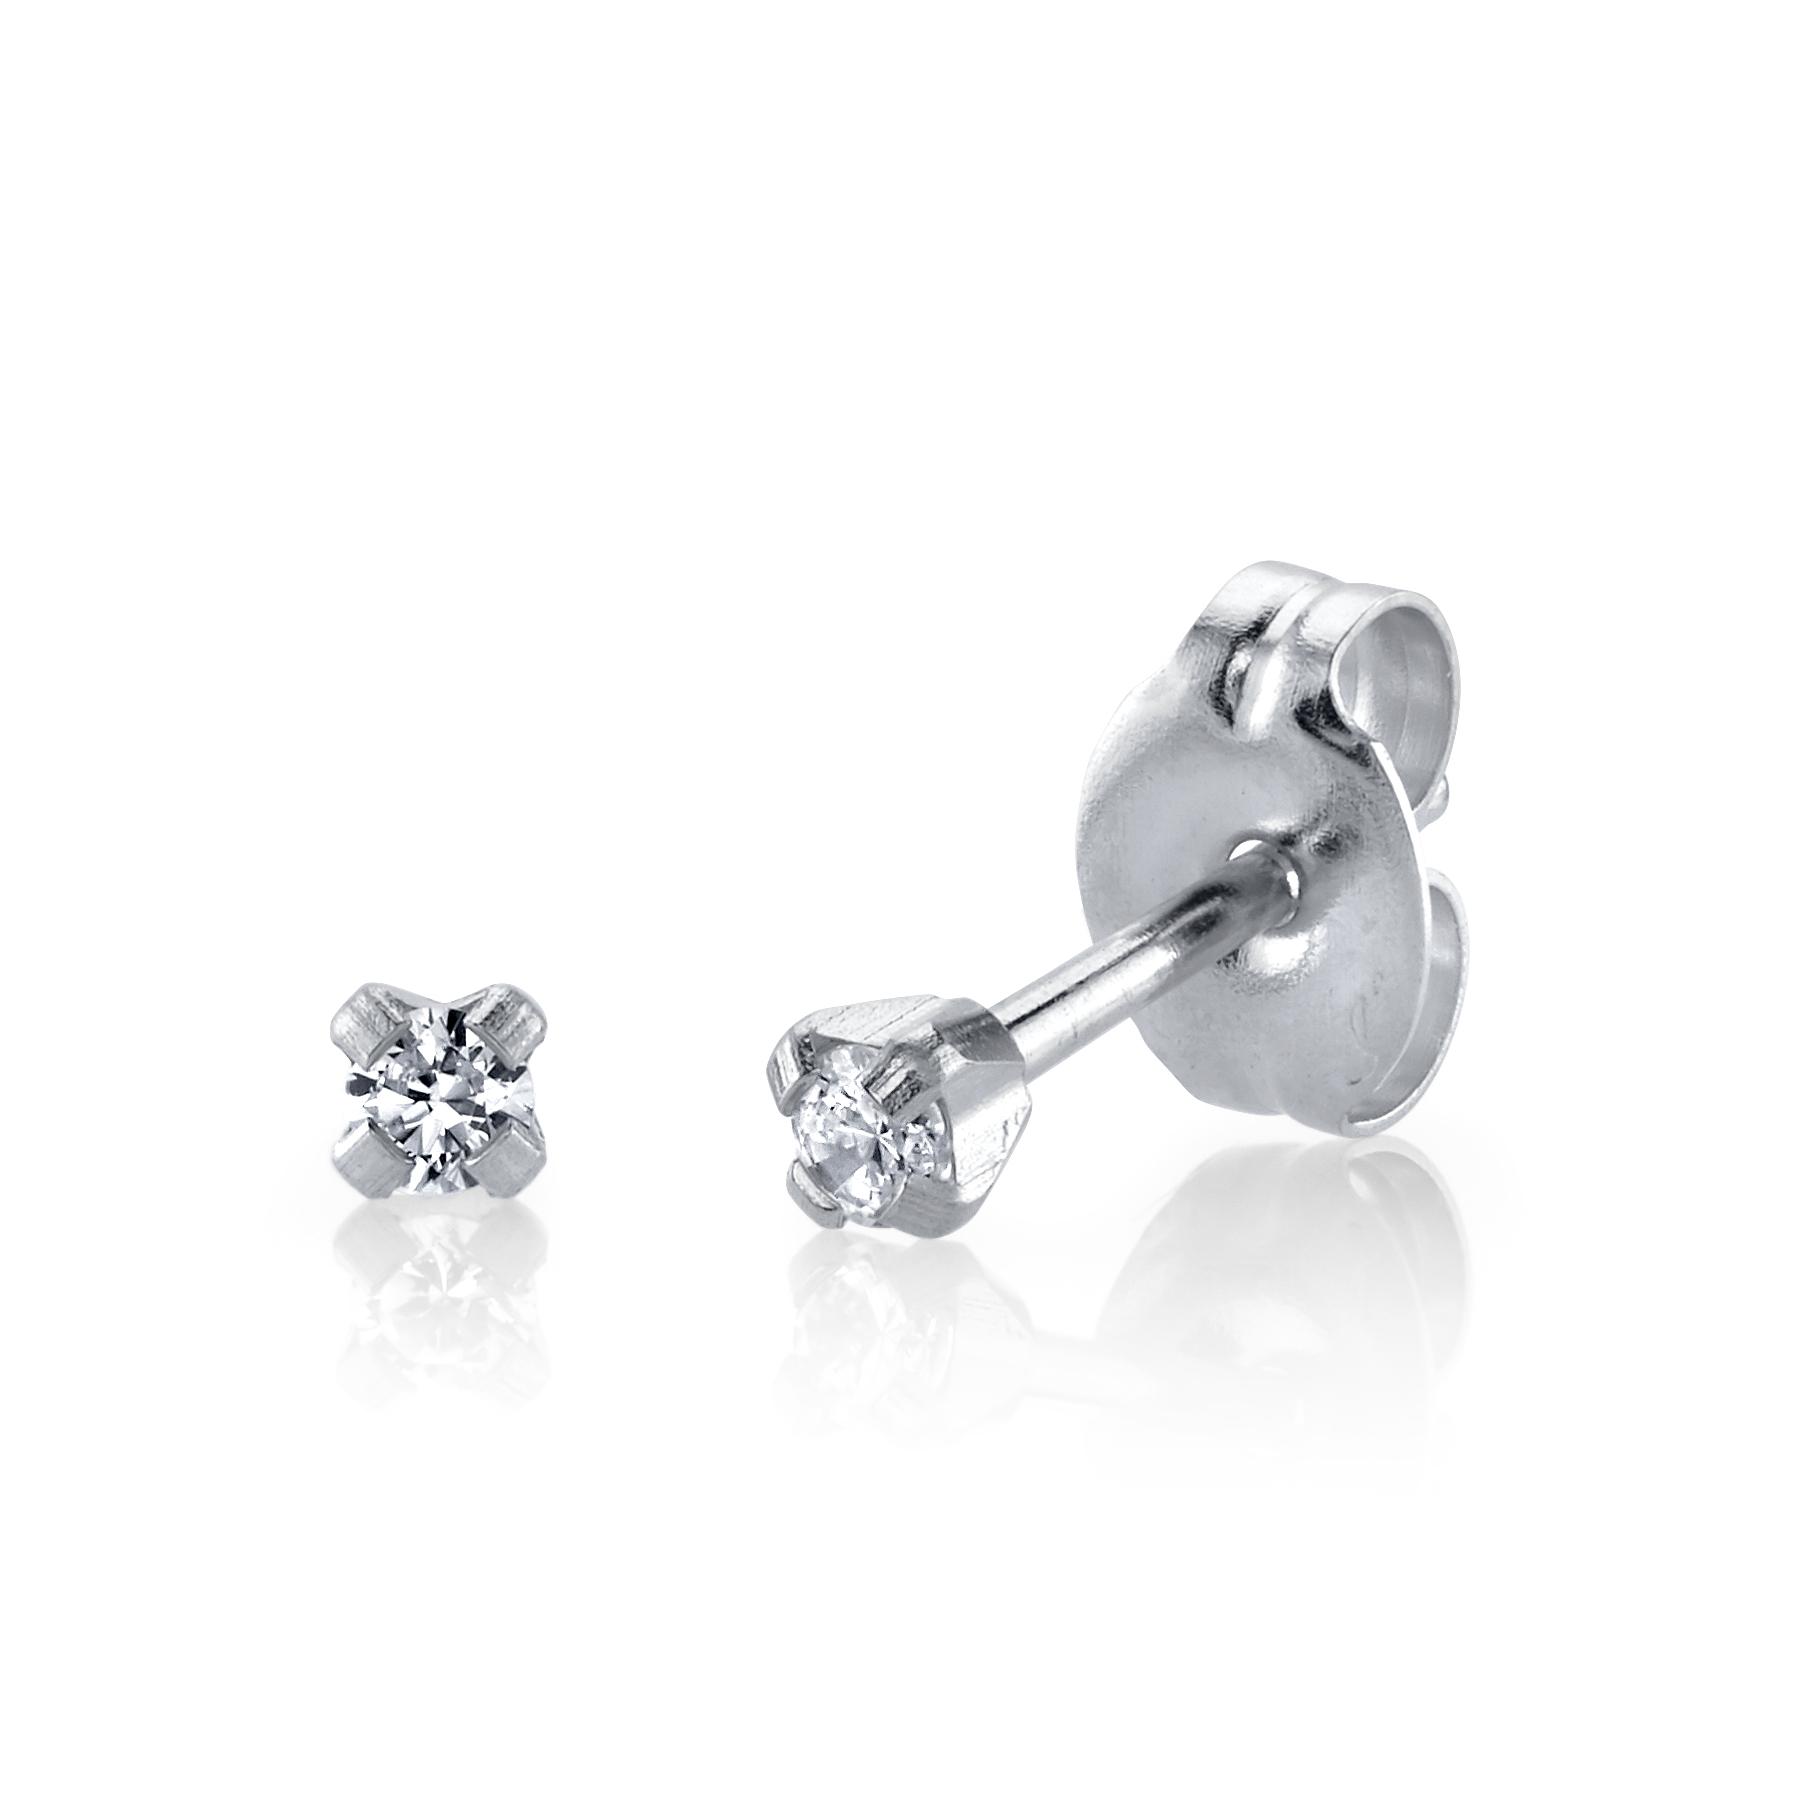 14K White Gold & Diamond Ear Piercing Studs